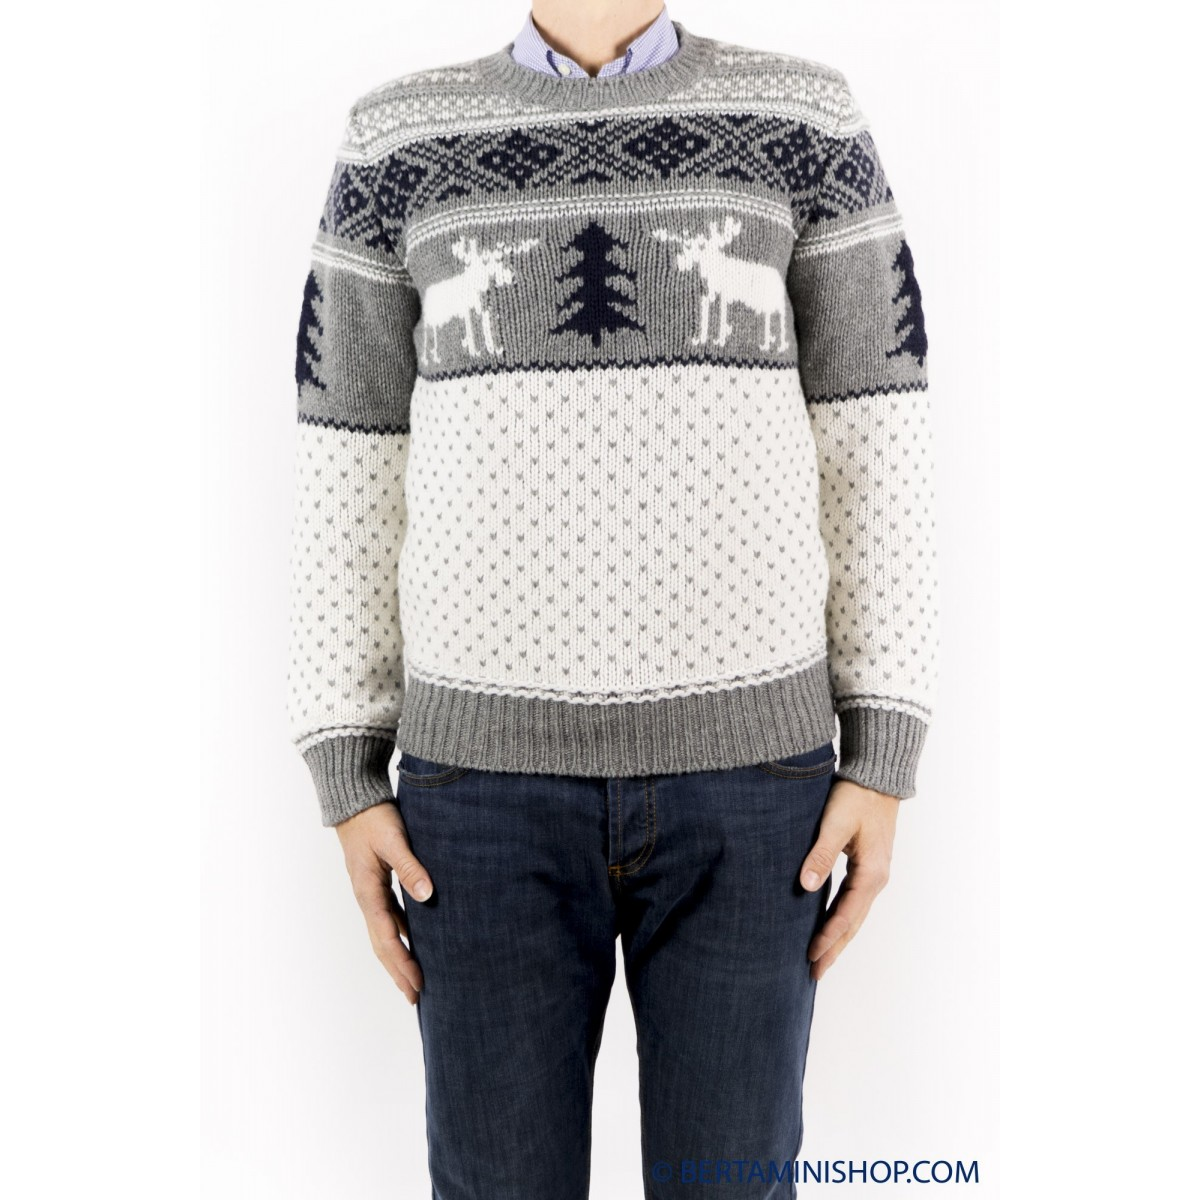 Maglia uomo Kangra - 9306/01 maglia 100% lana ricamata renna 32 - grigio medio